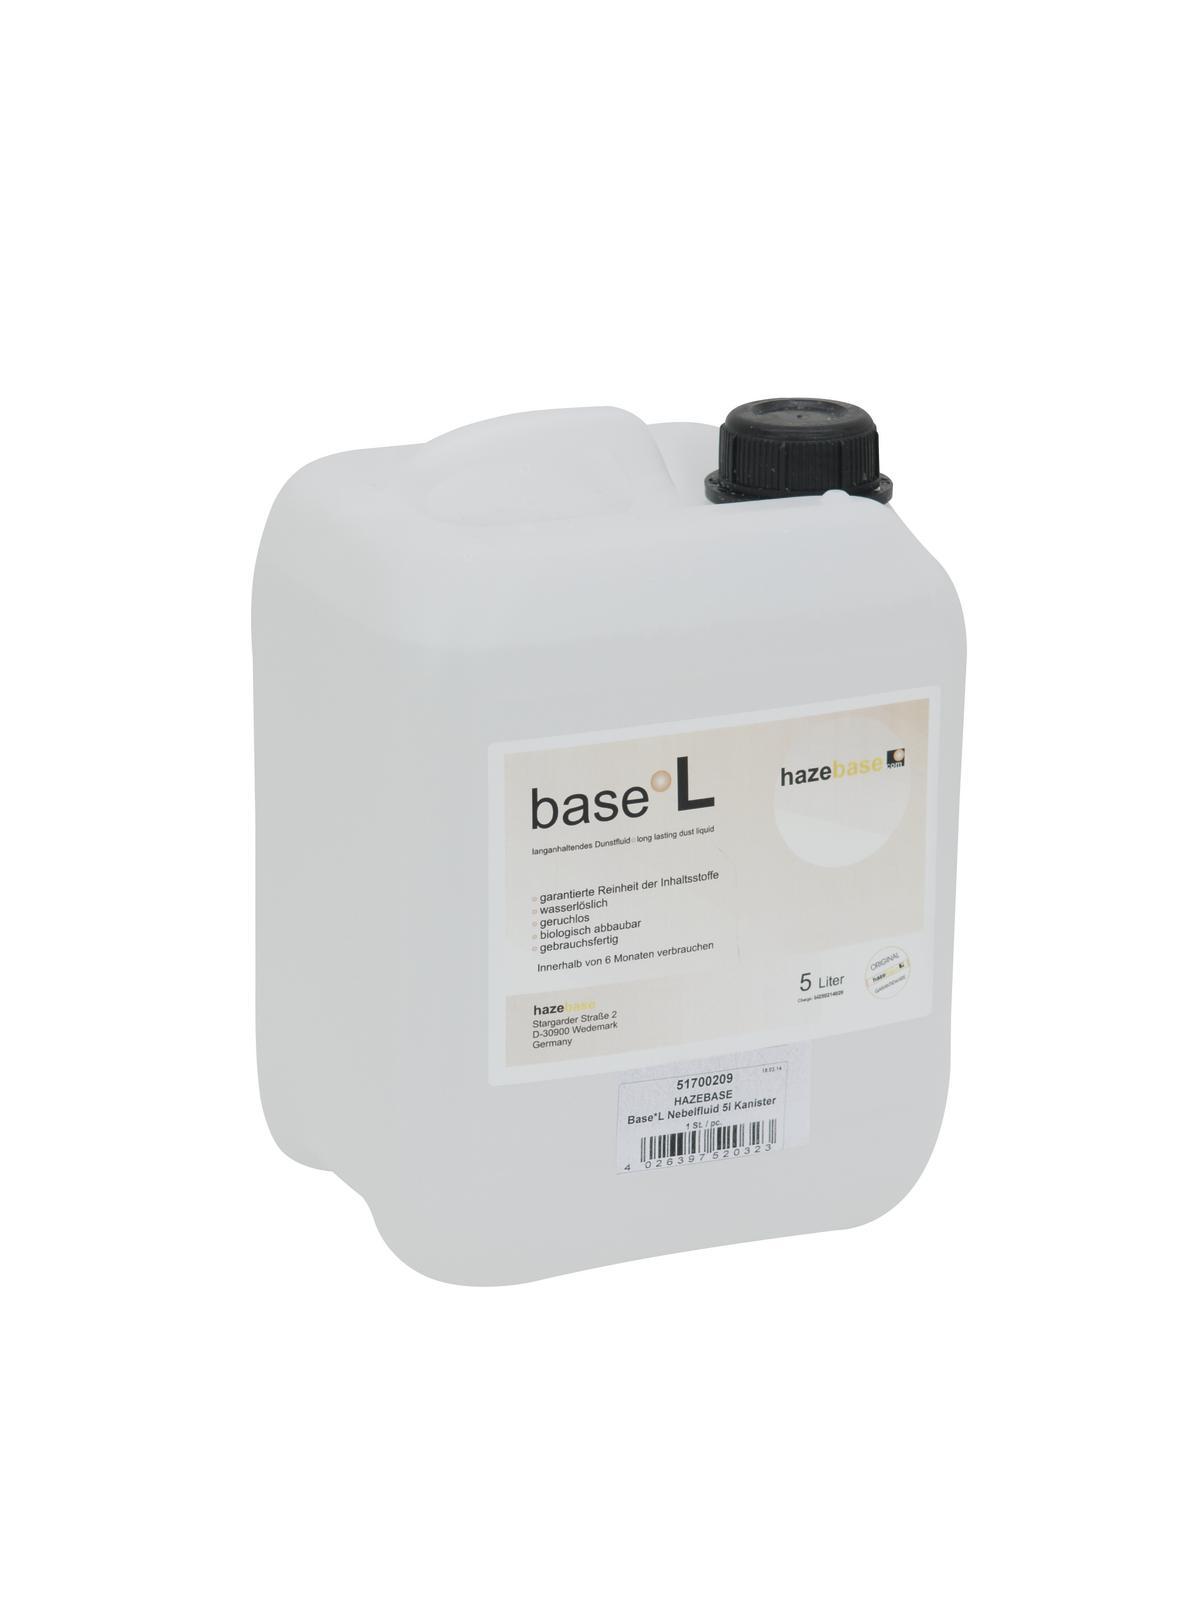 HAZEBASE Base*L Nebelfluid 5l Kanister